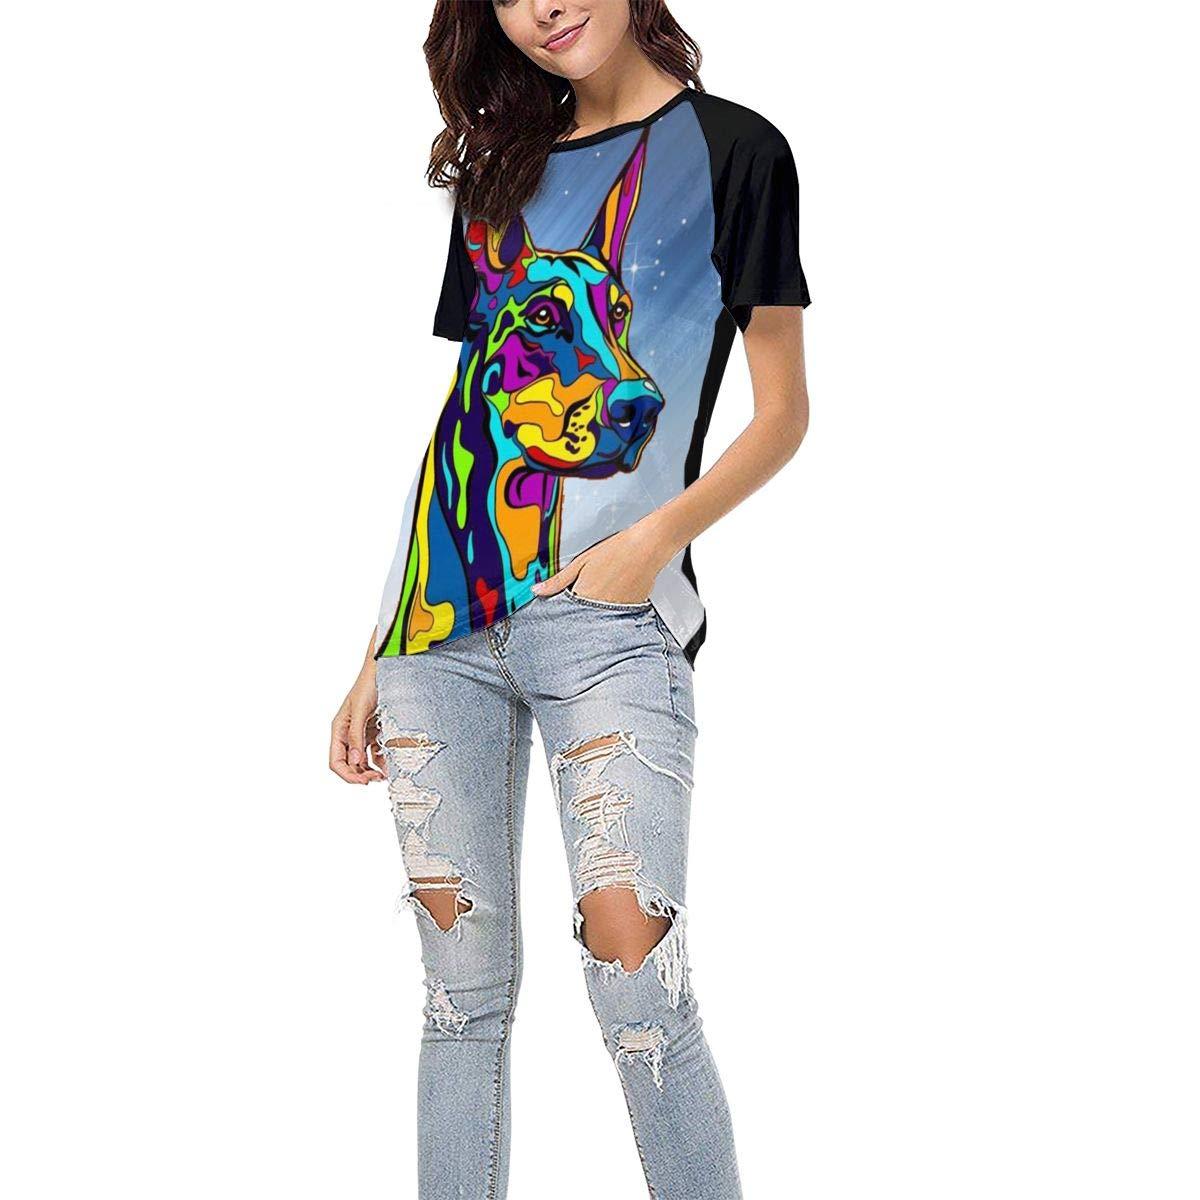 QWXZC Multi-Color Doberman Pug Womens Short Sleeves Baseball Tee Casual Raglan Shirt Baseball Raglan T-Shirt.Black.